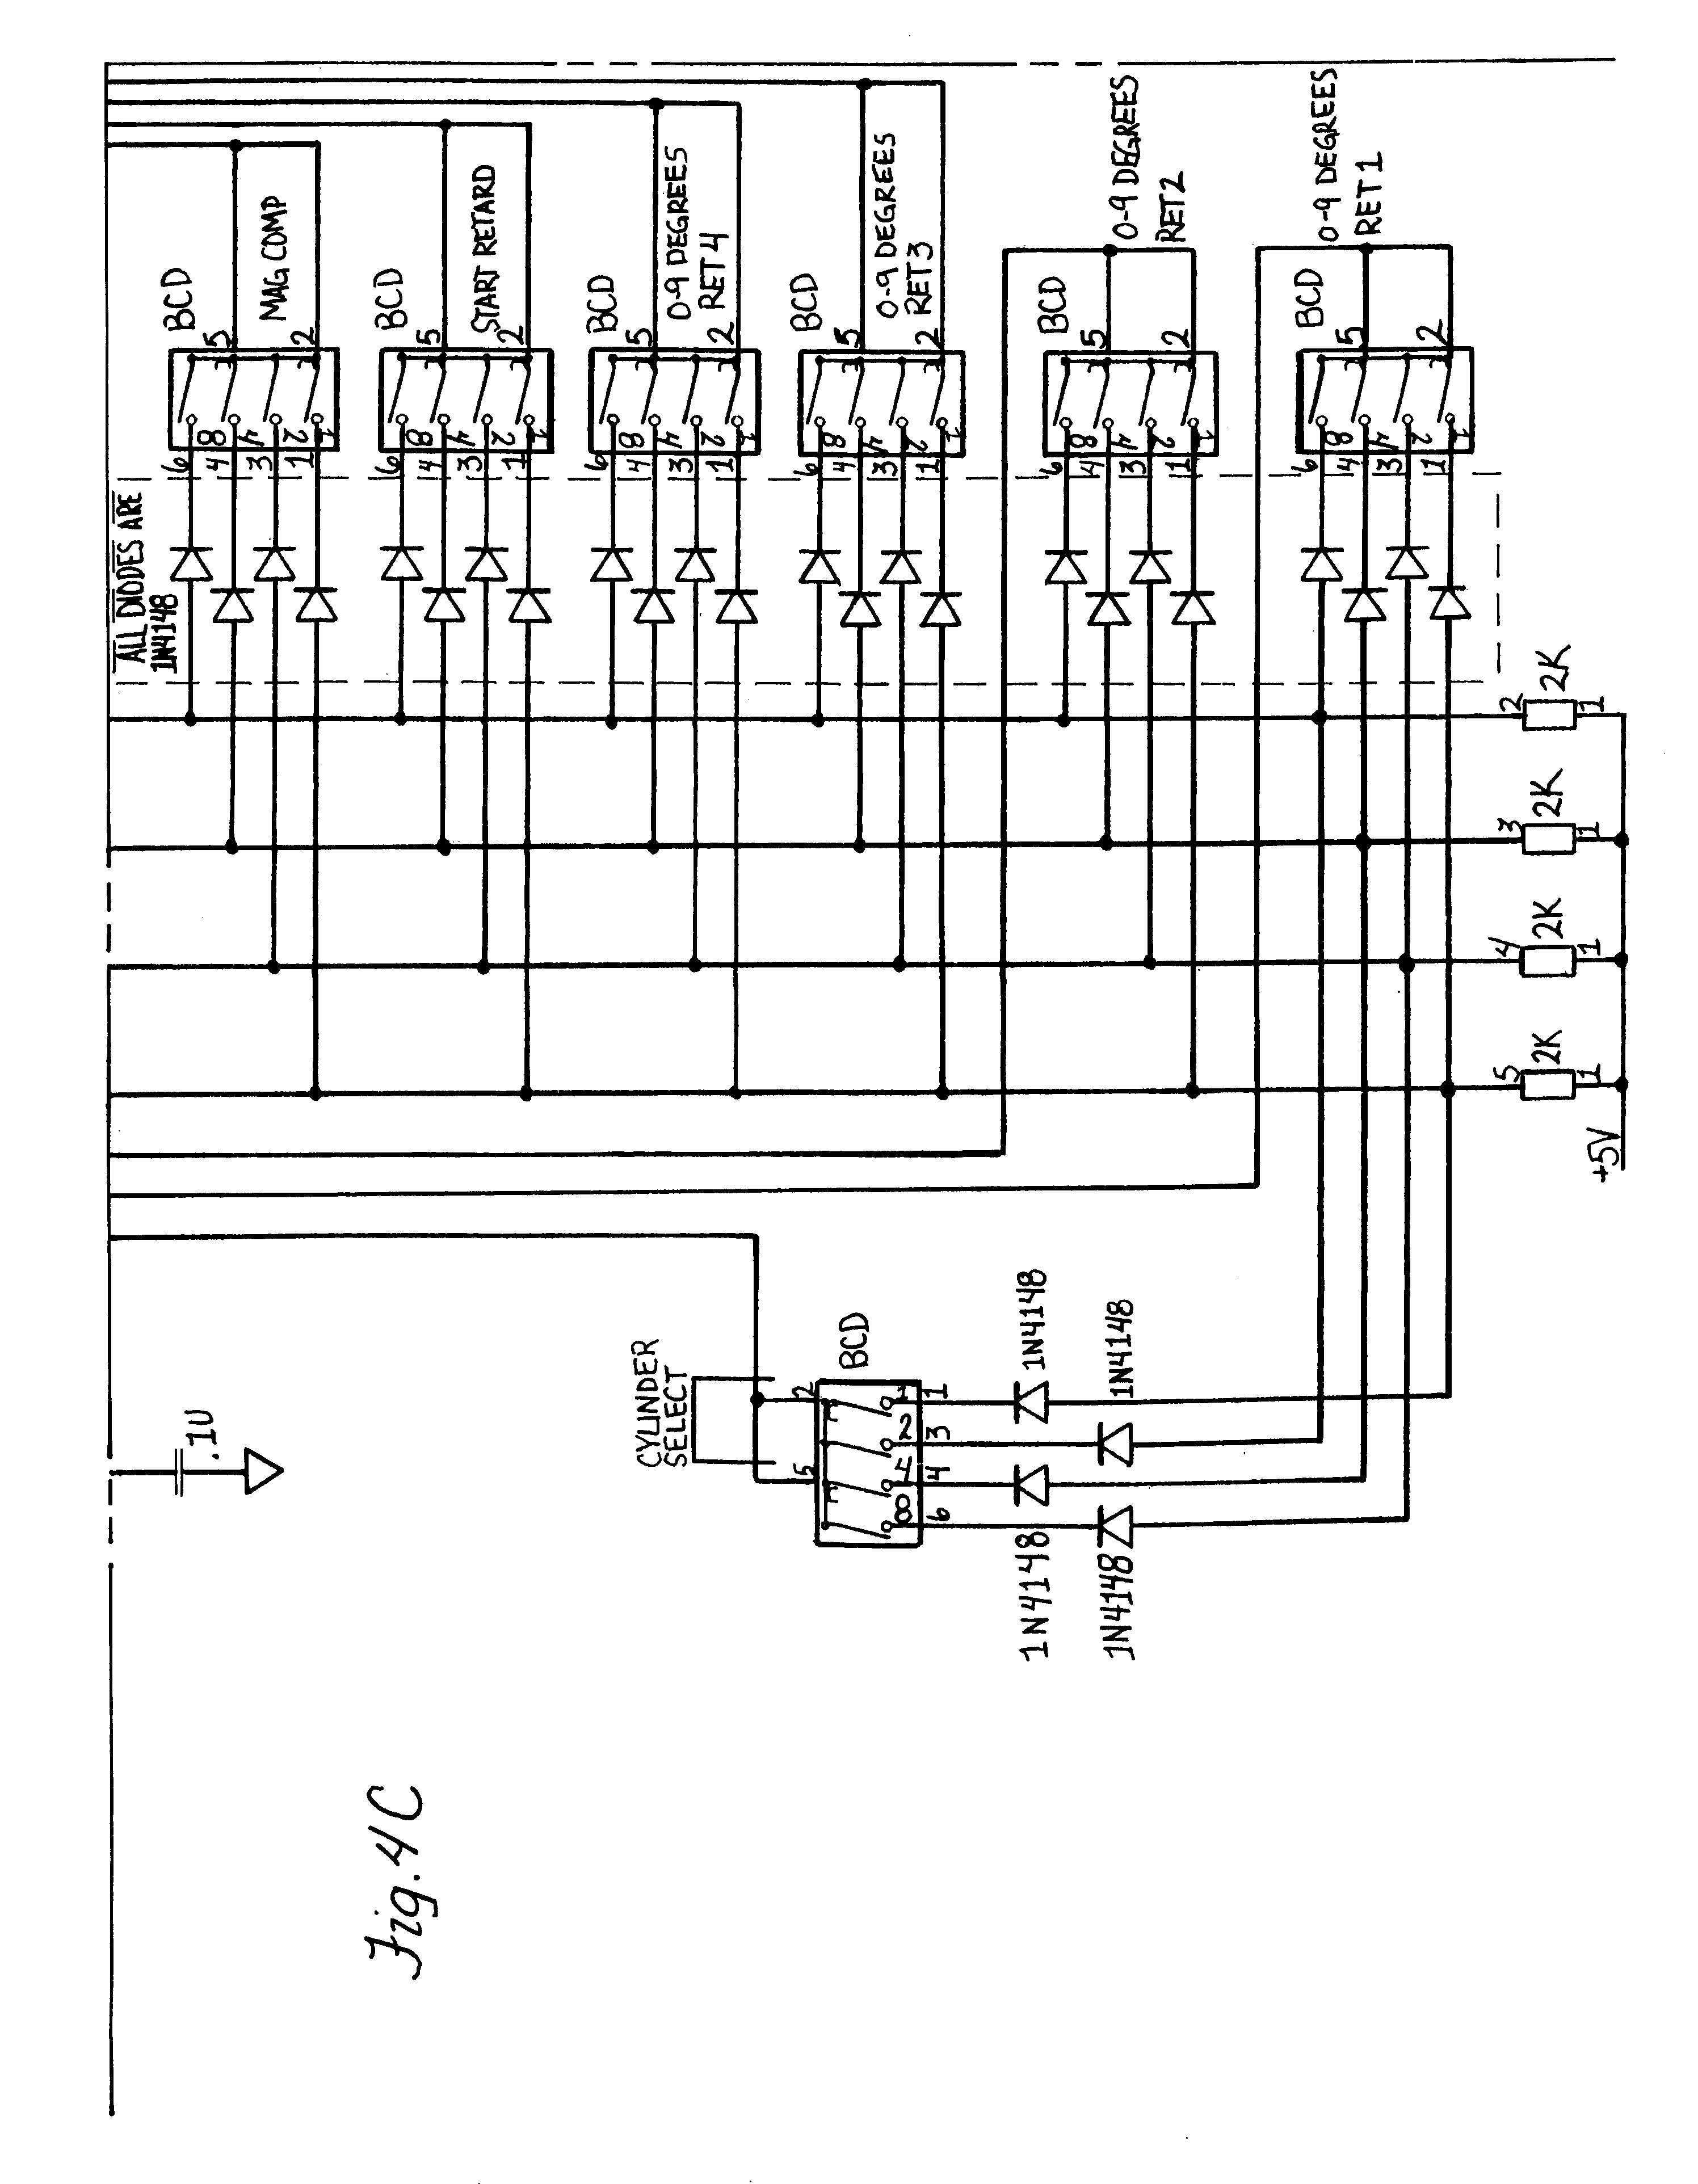 Toyota 3sgte Wiring Diagram Get Free Image About Wiring Diagram